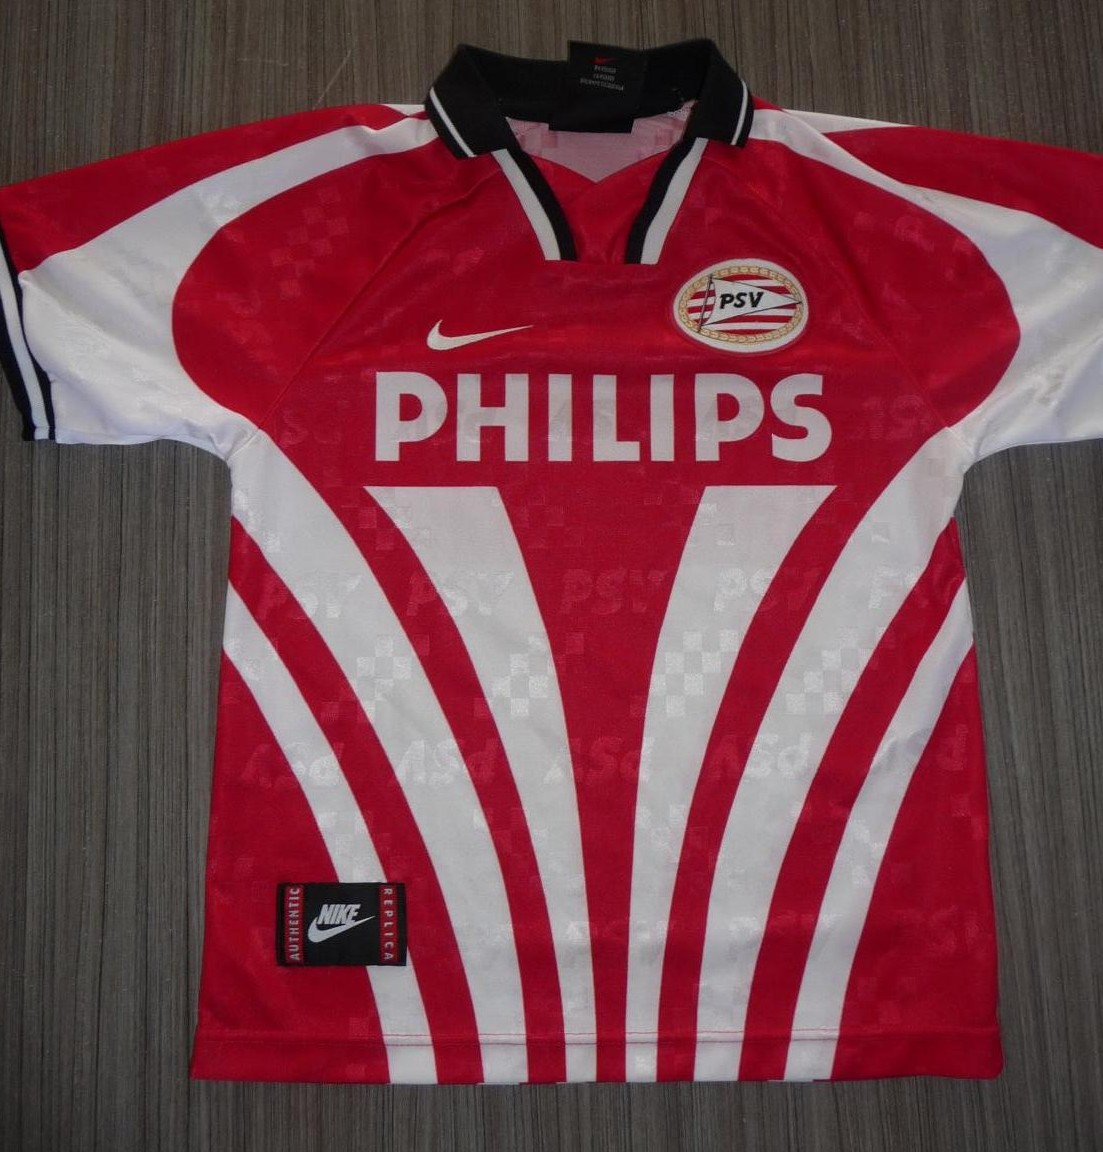 http://www.oldfootballshirts.com/img/shirts/282/psv-eindhoven-home-football-shirt-1994-1995-s_4459_1.jpg